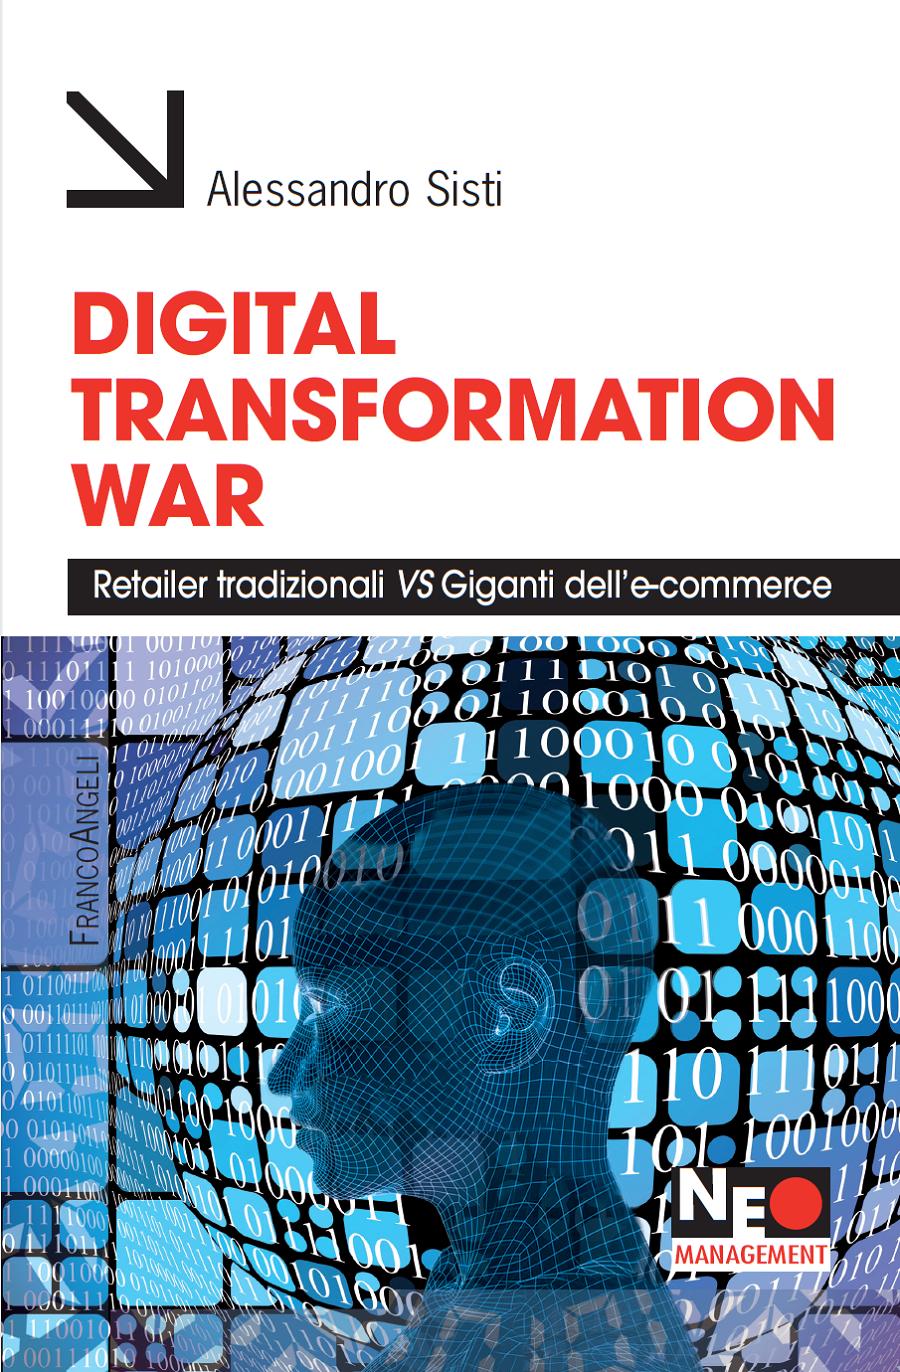 https://www.promotionmagazine.it/wp/wp-content/uploads/2017/06/digital_transformation_war.png